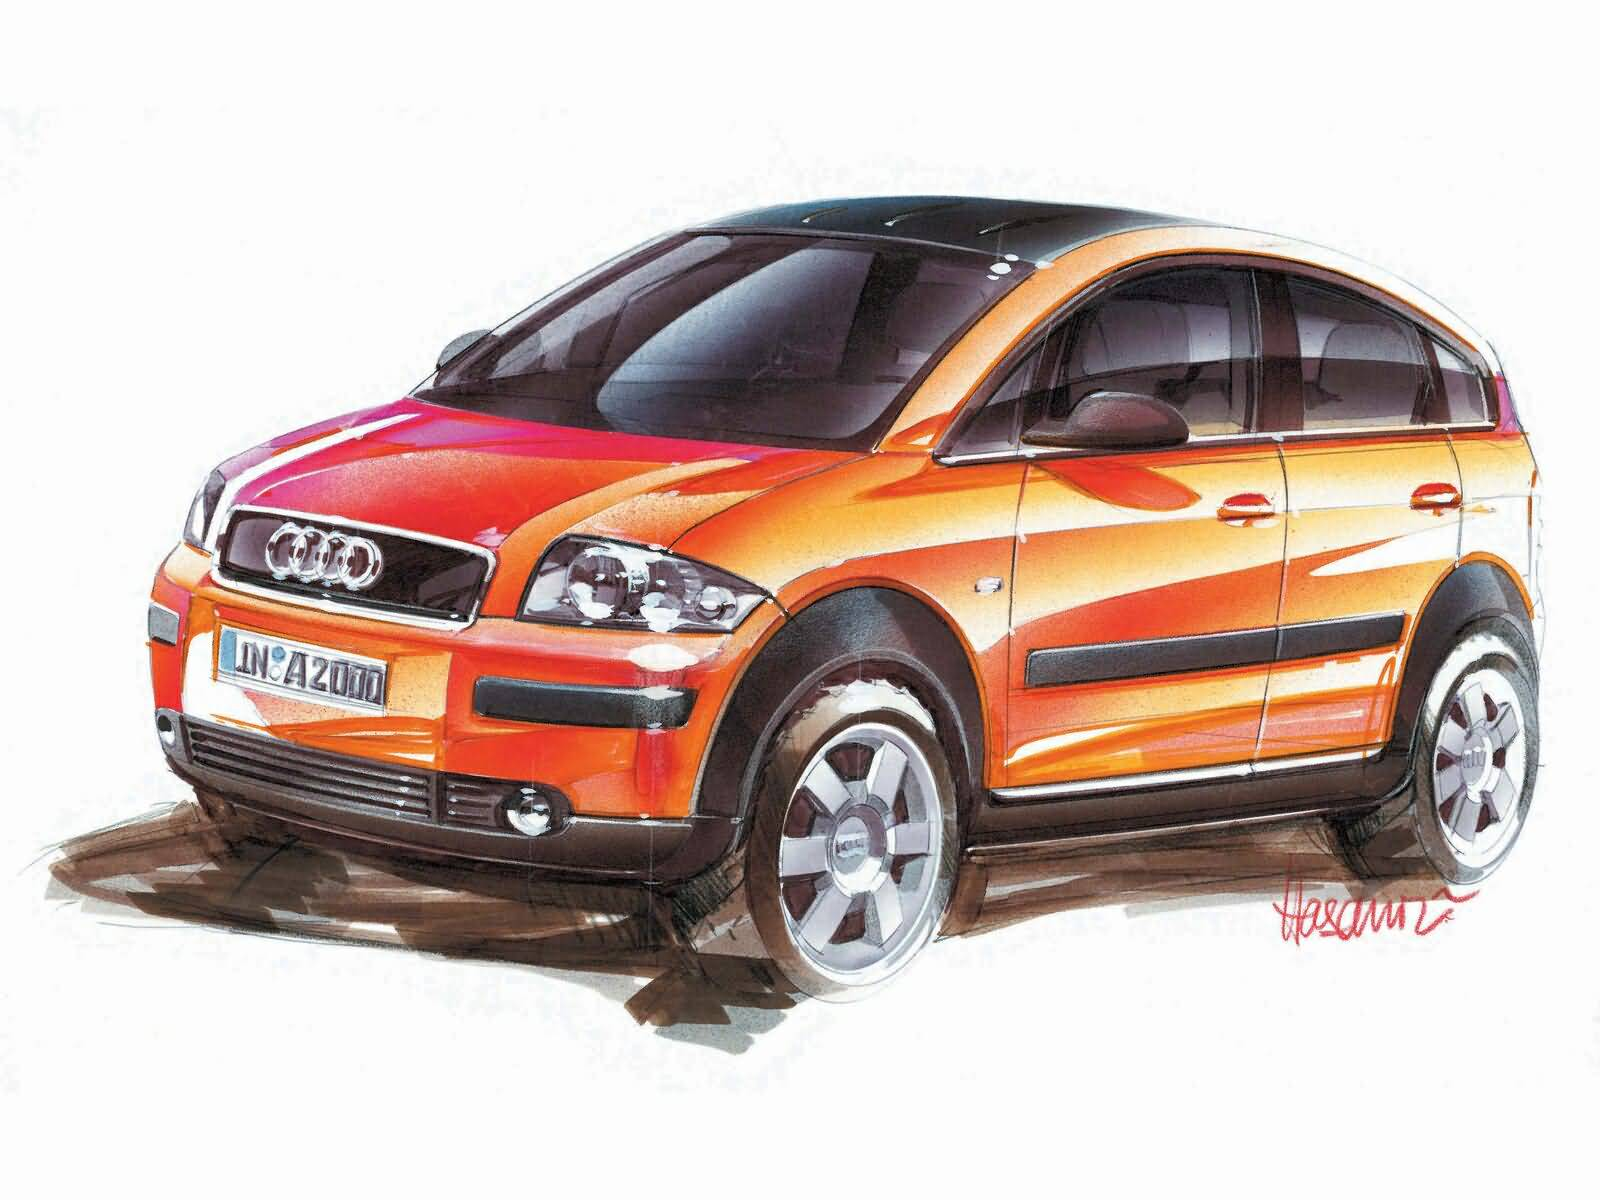 latest Audi A2 Car